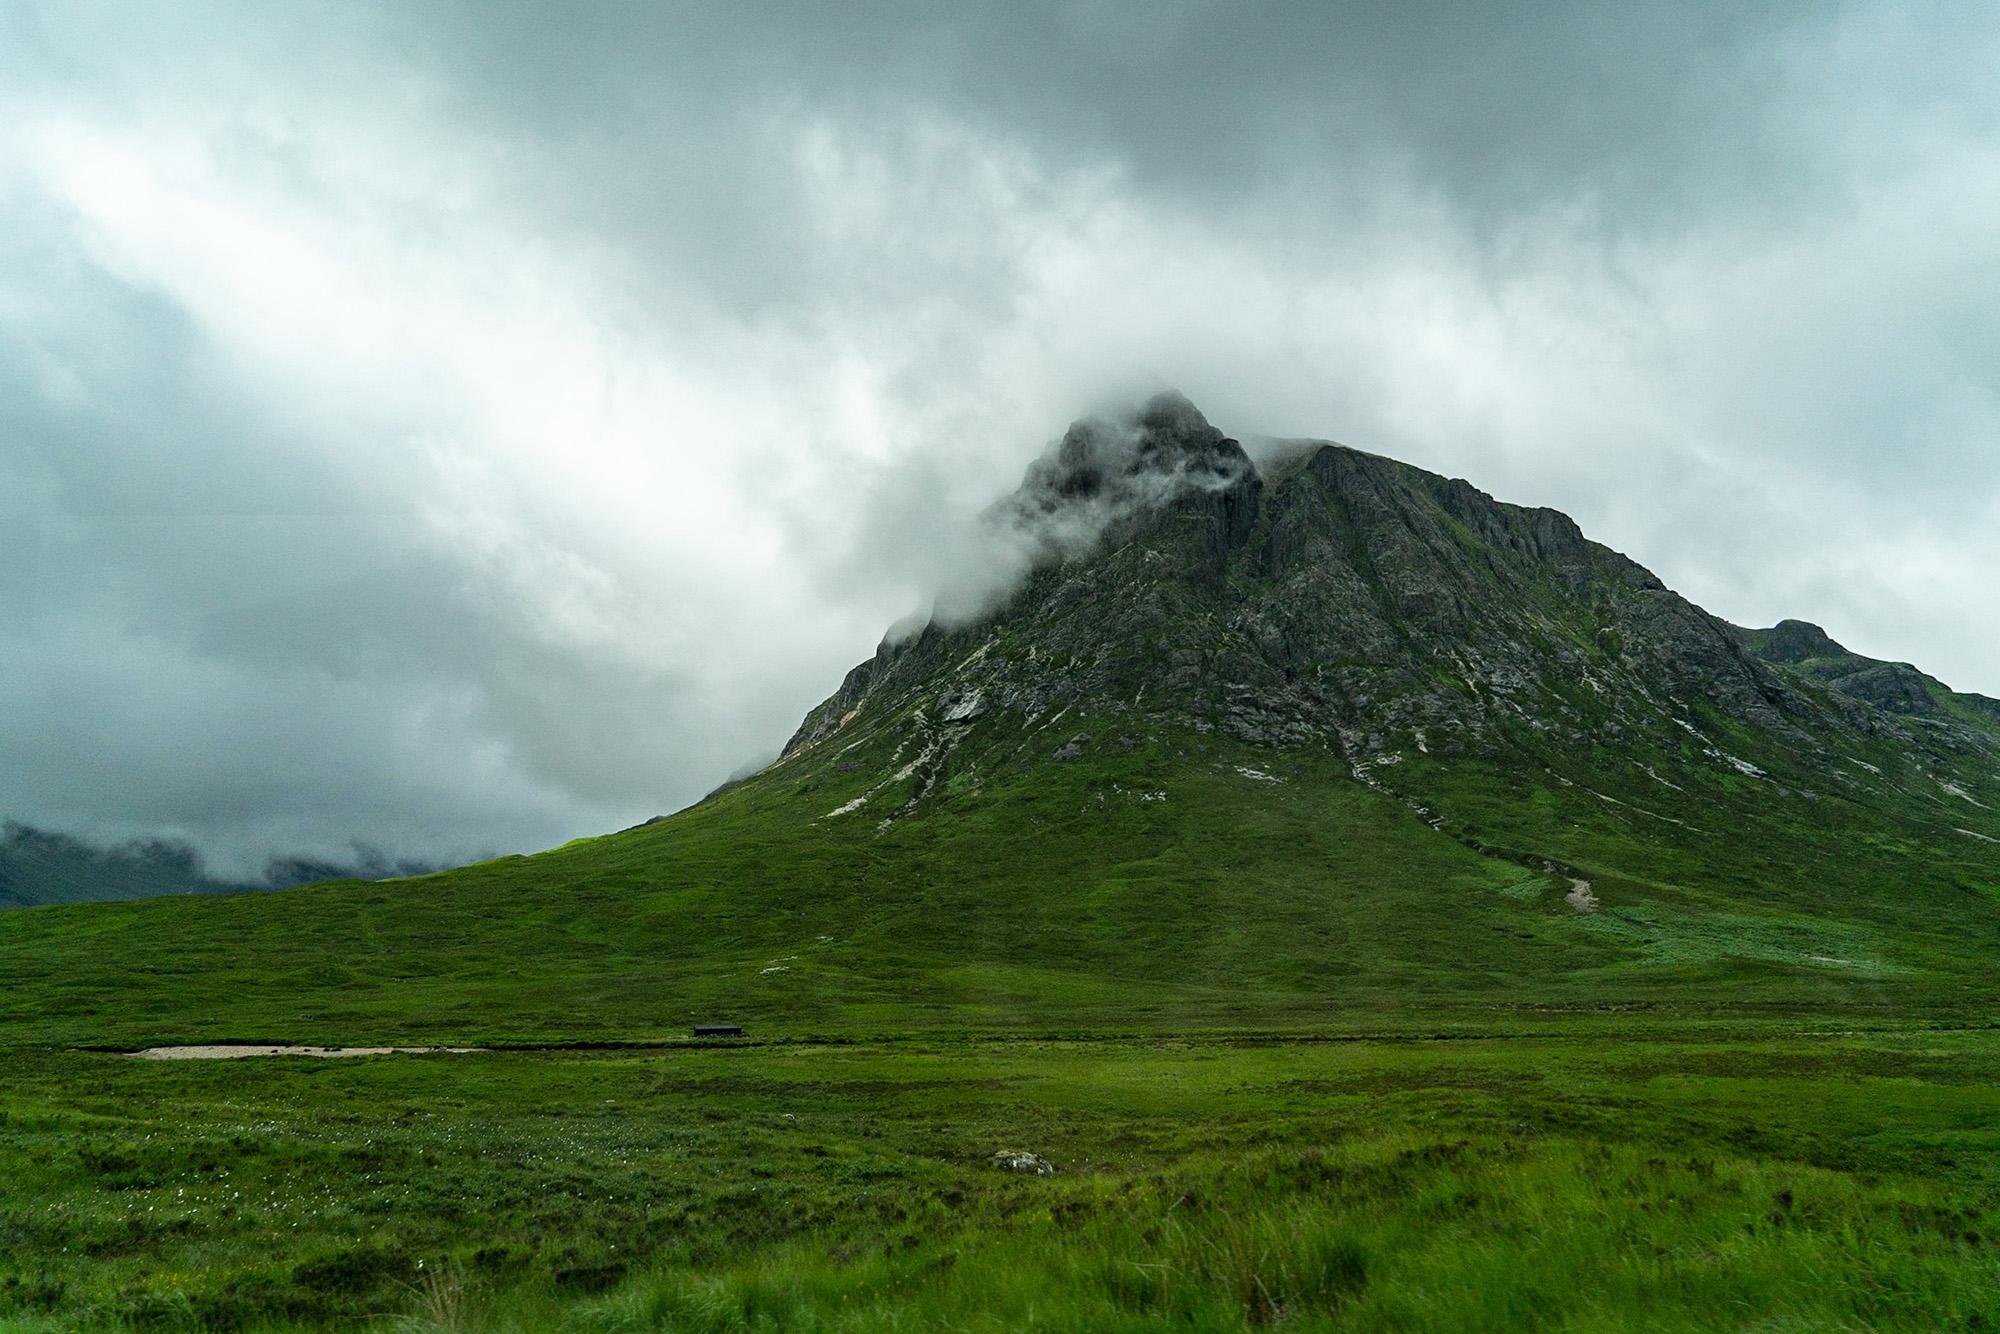 #scotland, #highlands, #scottish, #glencoe, #weather, #clouds, #mist, #rain, #green, #rugged